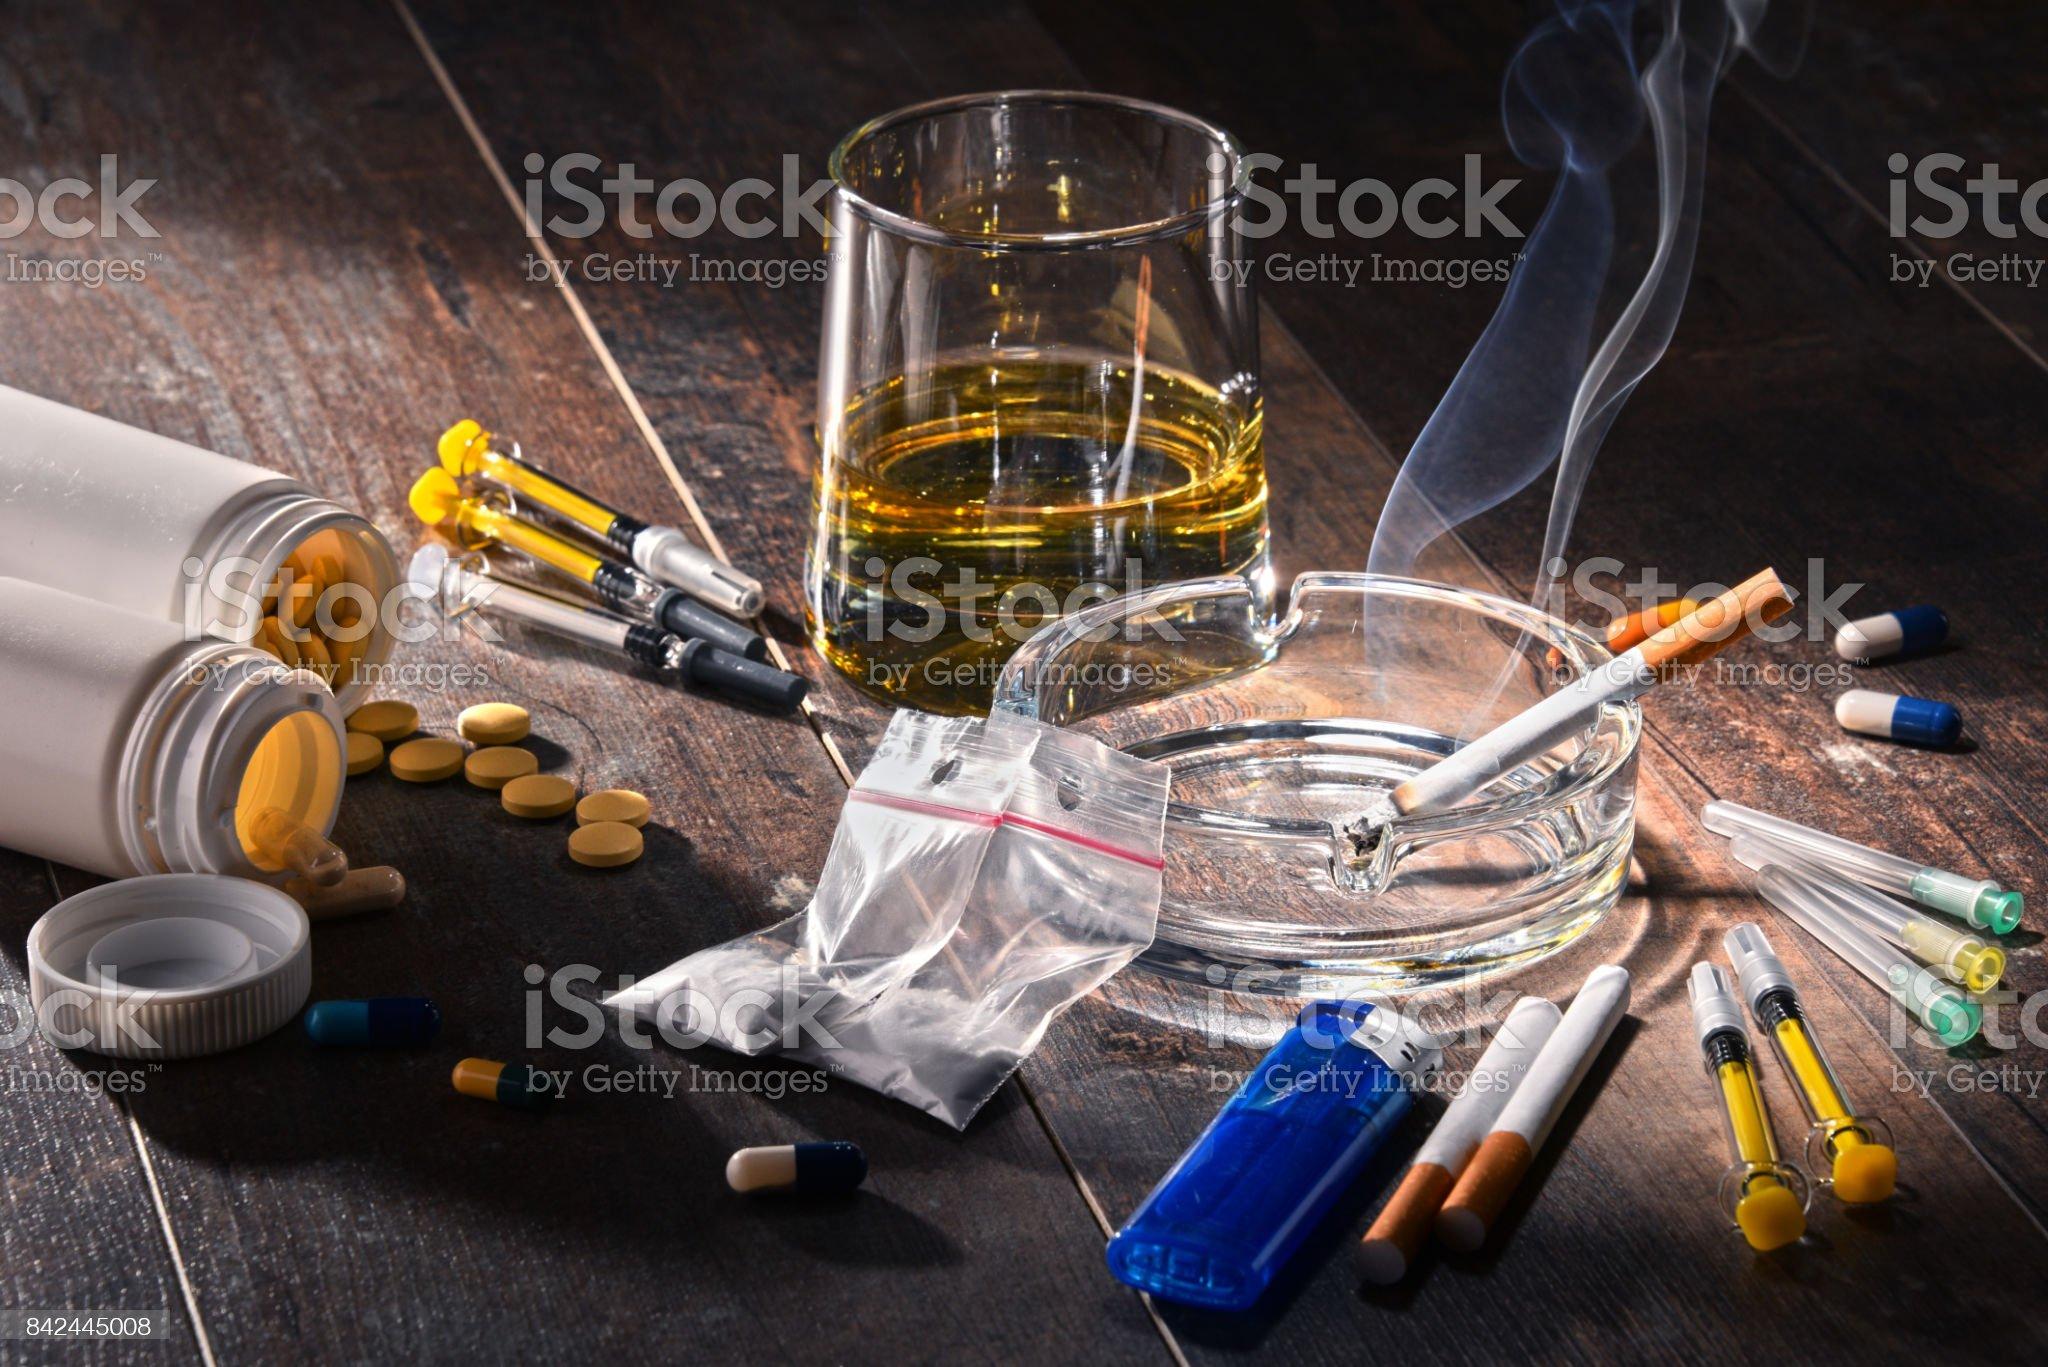 Addictive substances, including alcohol, cigarettes and drugs Addictive substances, including alcohol, cigarettes and drugs. Recreational Drug Stock Photo